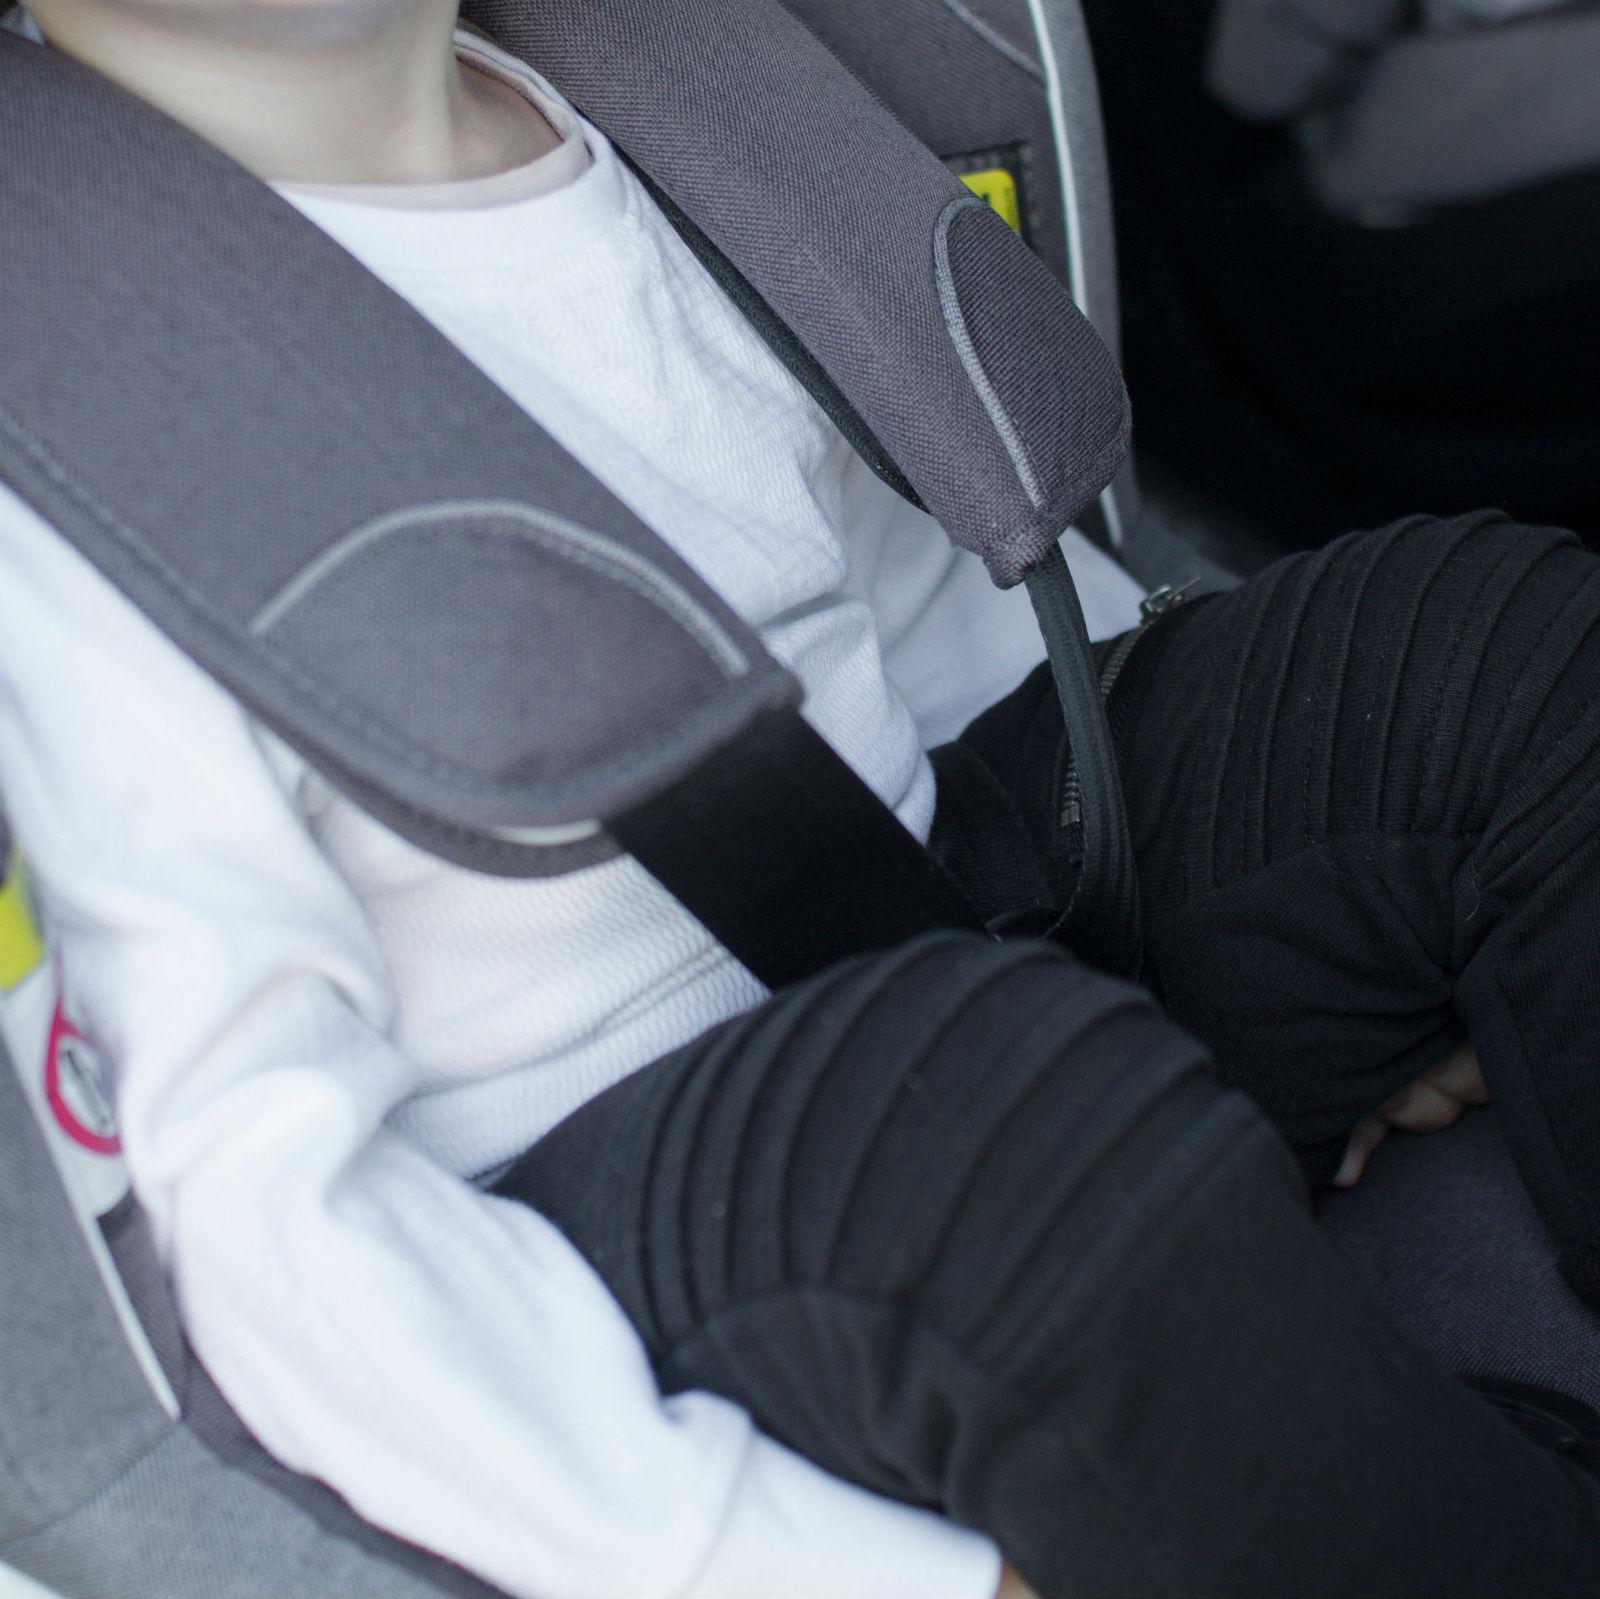 winter jackets in car seats instruction 2